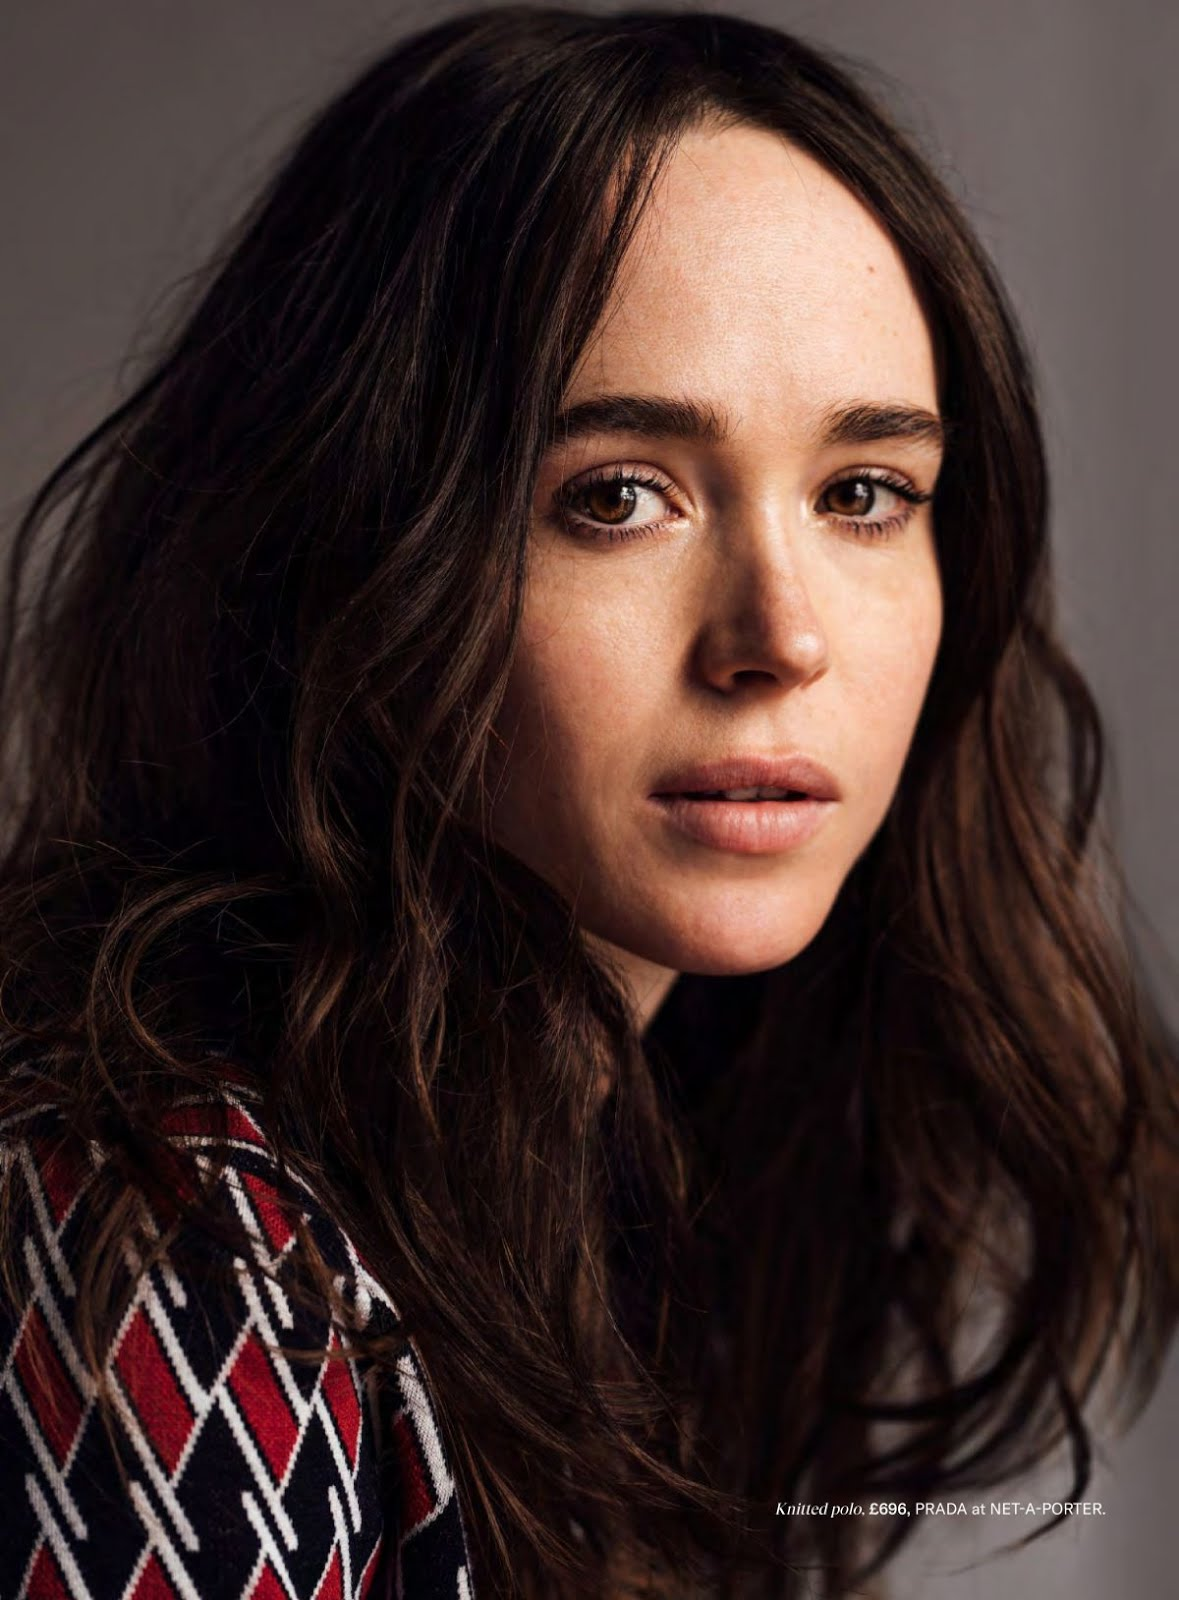 Ellen Page Wallpapers HD - Wallpaper Cave